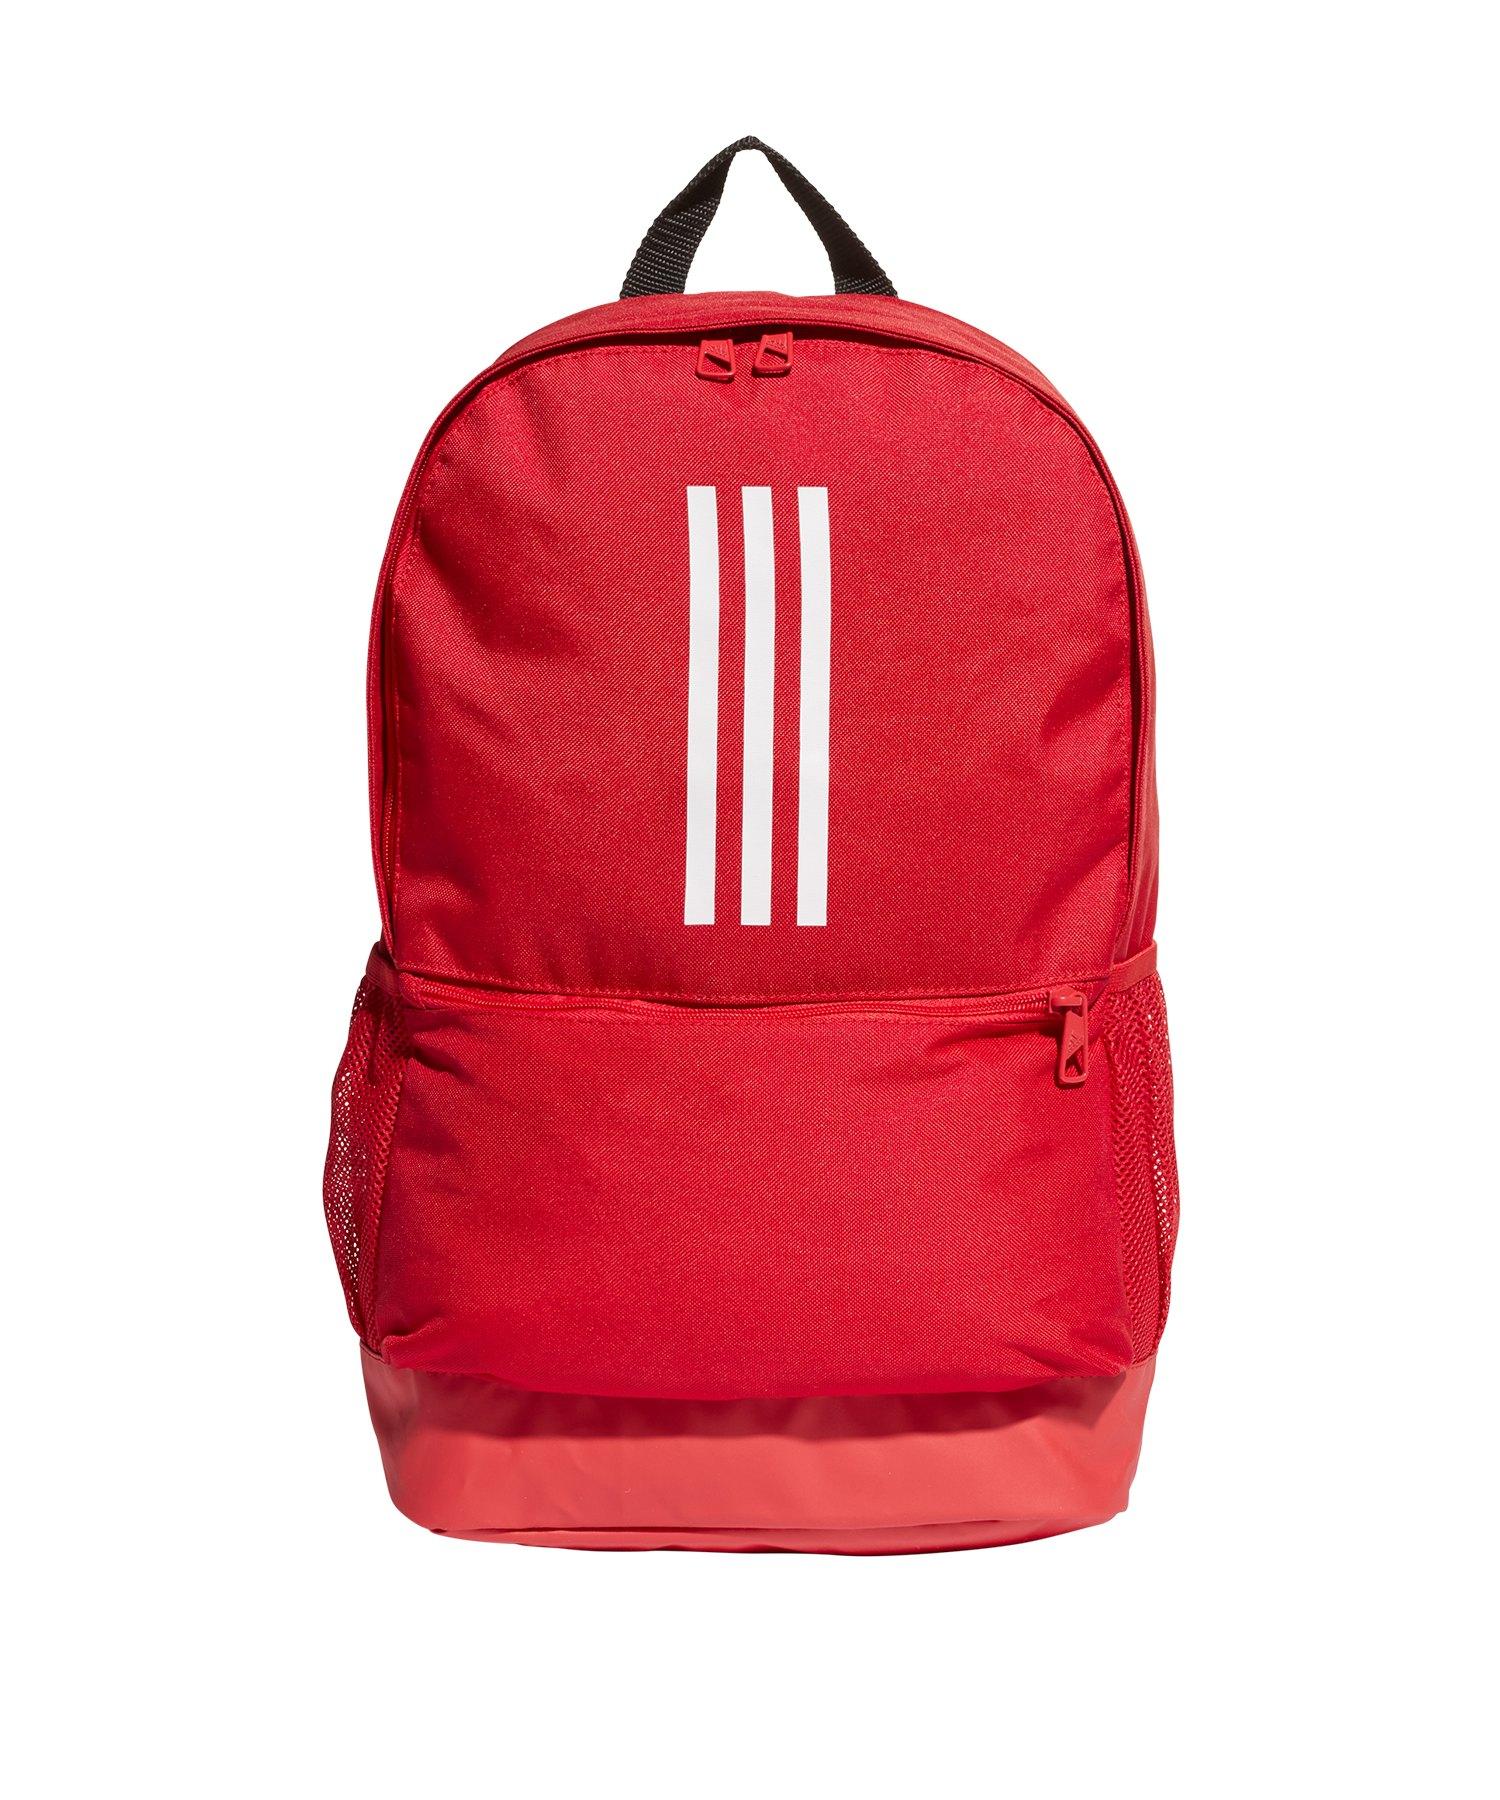 e487919fa89f6 adidas Tiro Backpack Rucksack Rot Weiss - rot